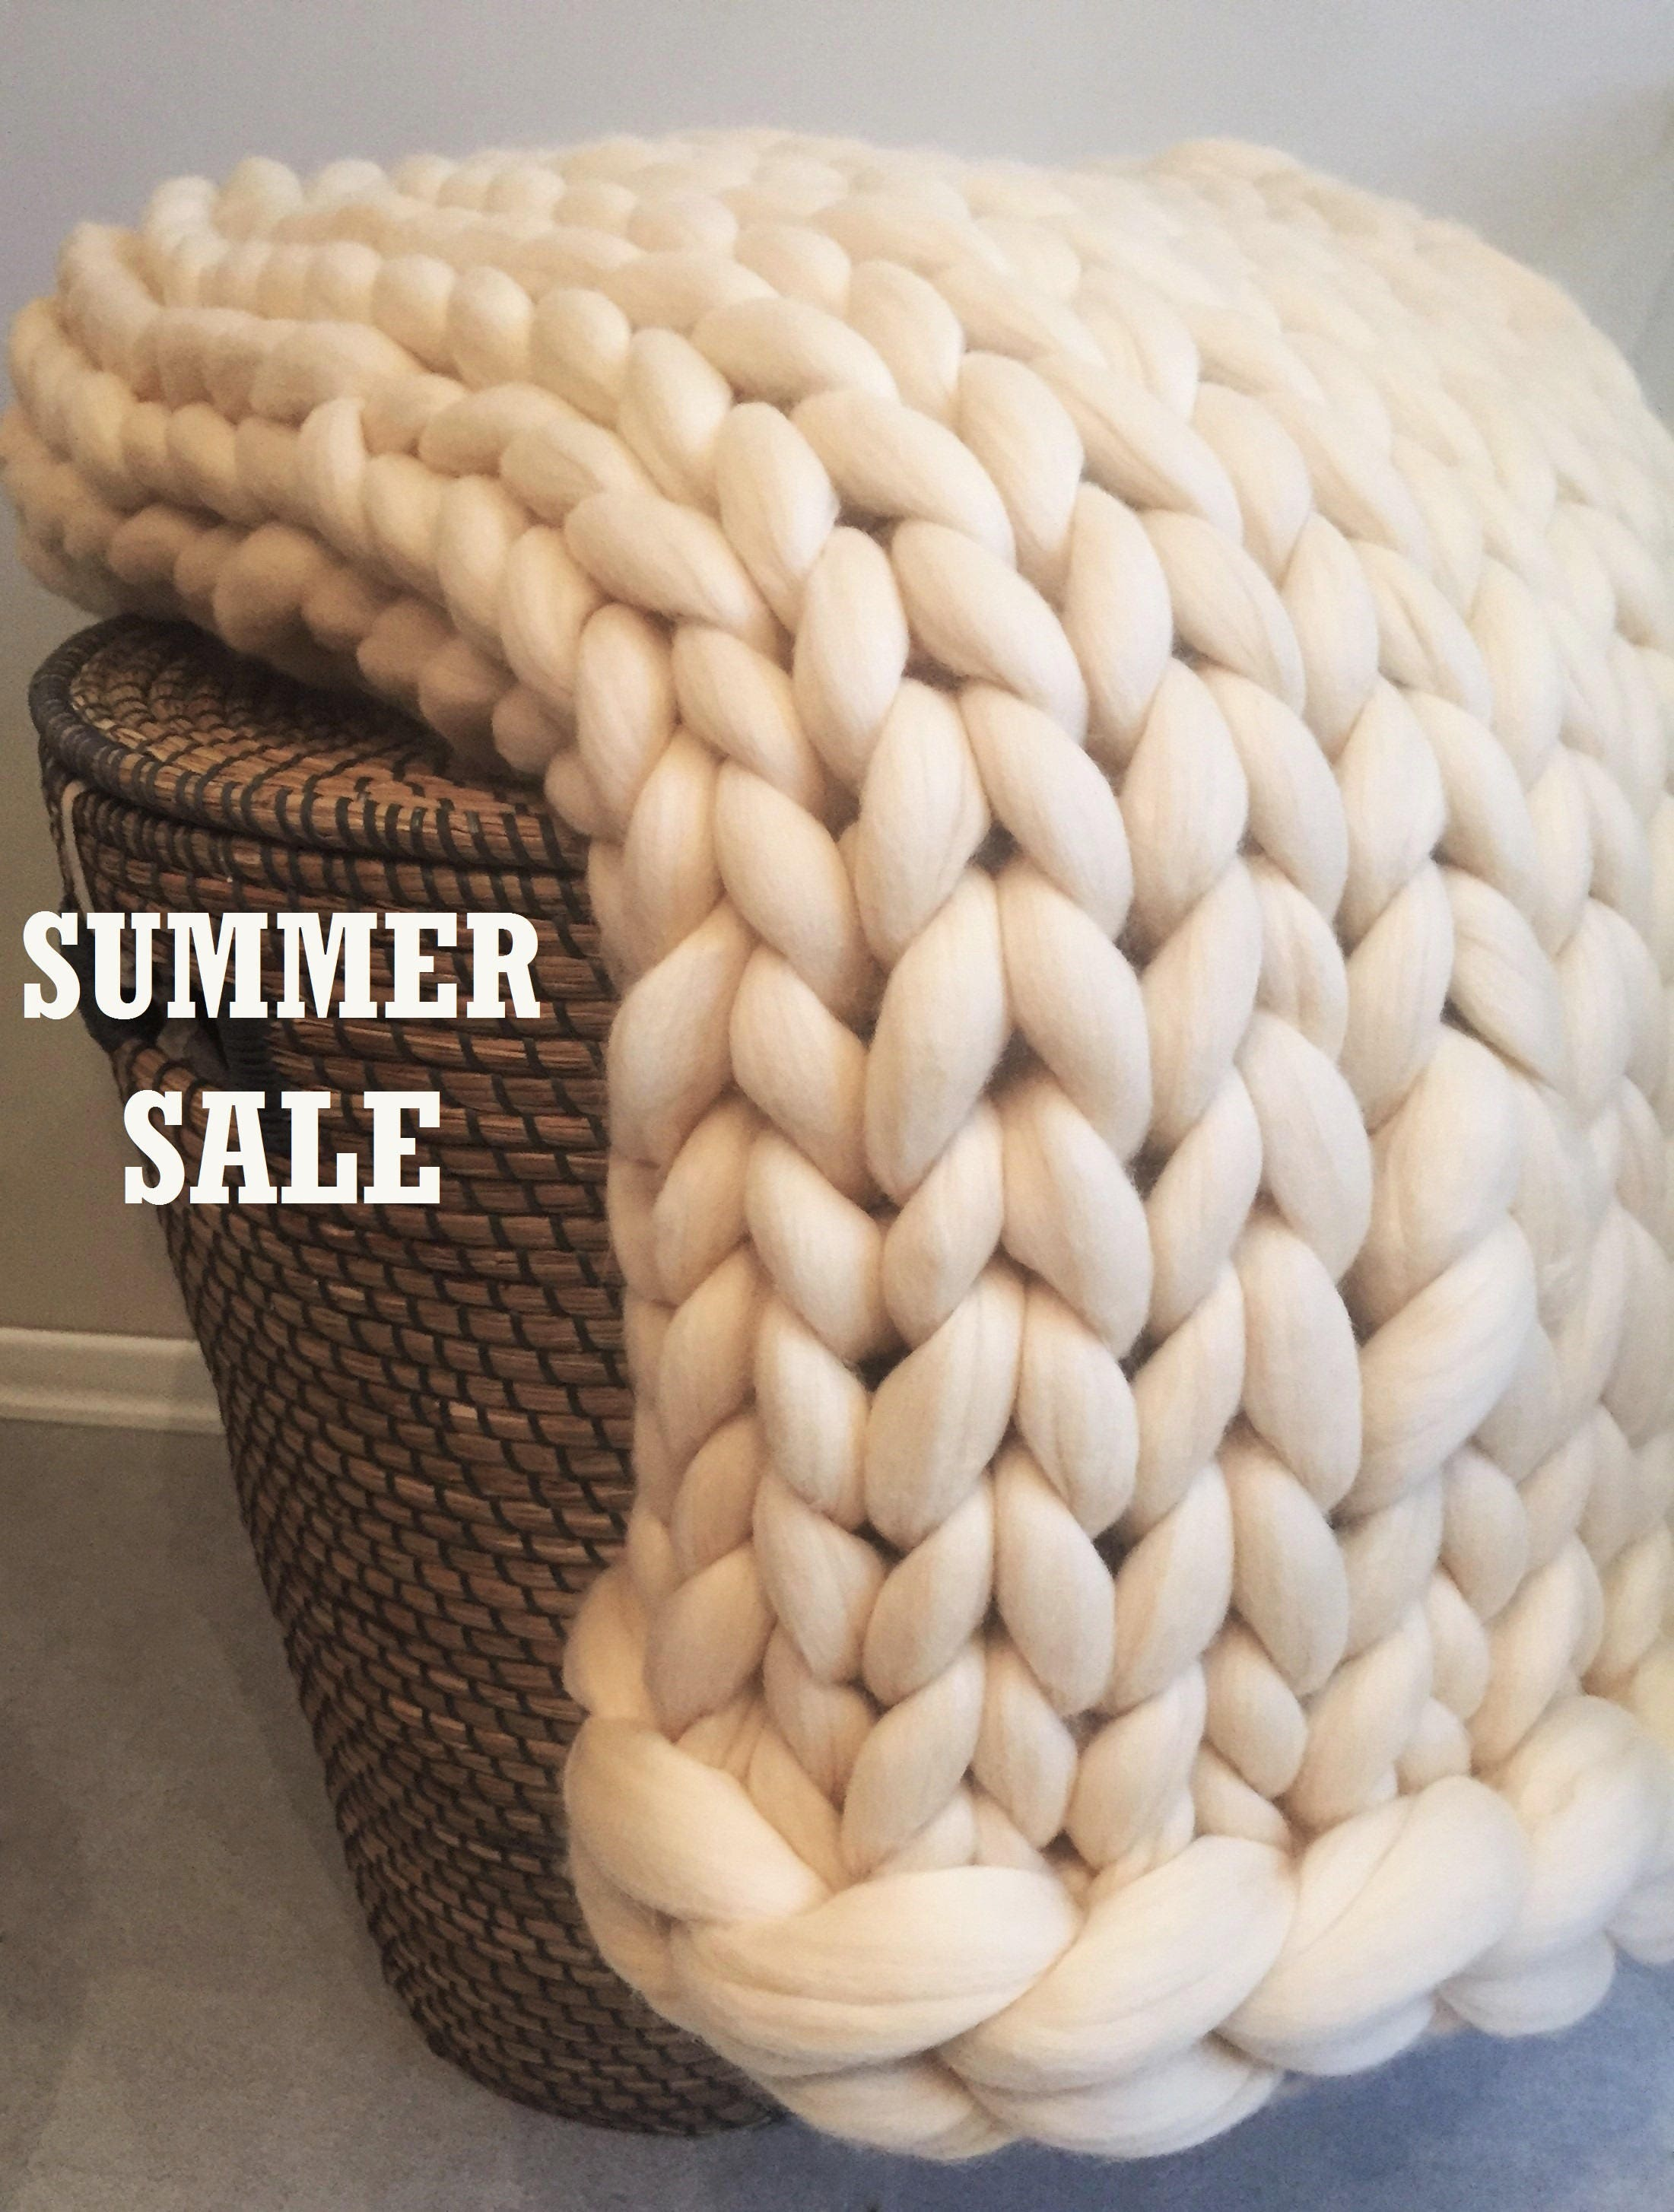 chunky knit blanket premium 18 microns merino wool blanket. Black Bedroom Furniture Sets. Home Design Ideas